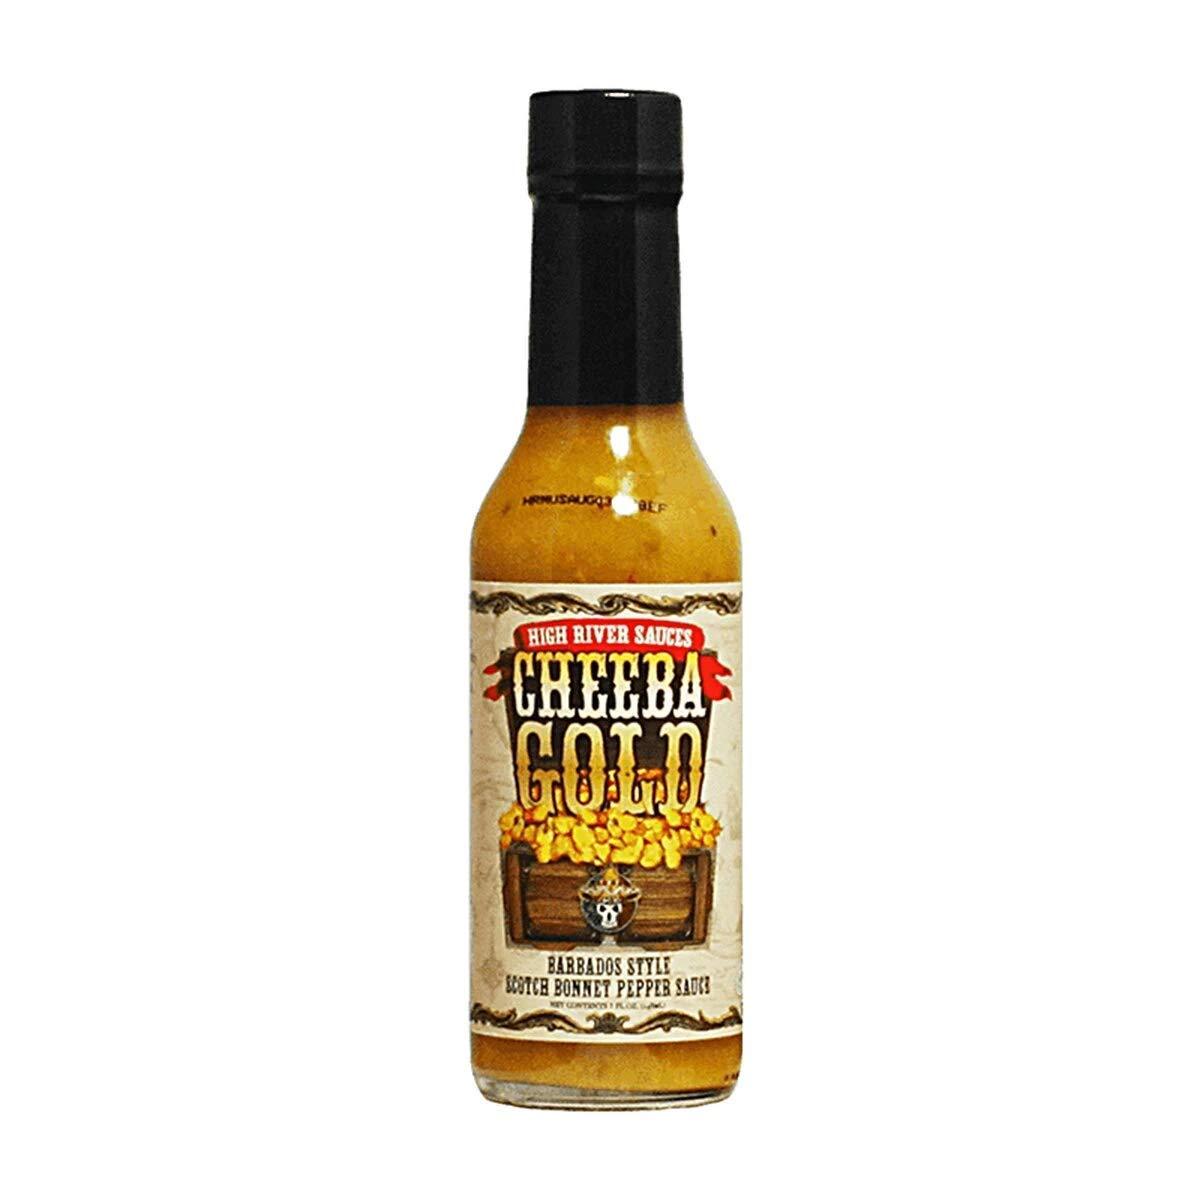 High River Sauces Cheeba Gold Barbados Style Scotch Bonnet Pepper Sauce (Single)